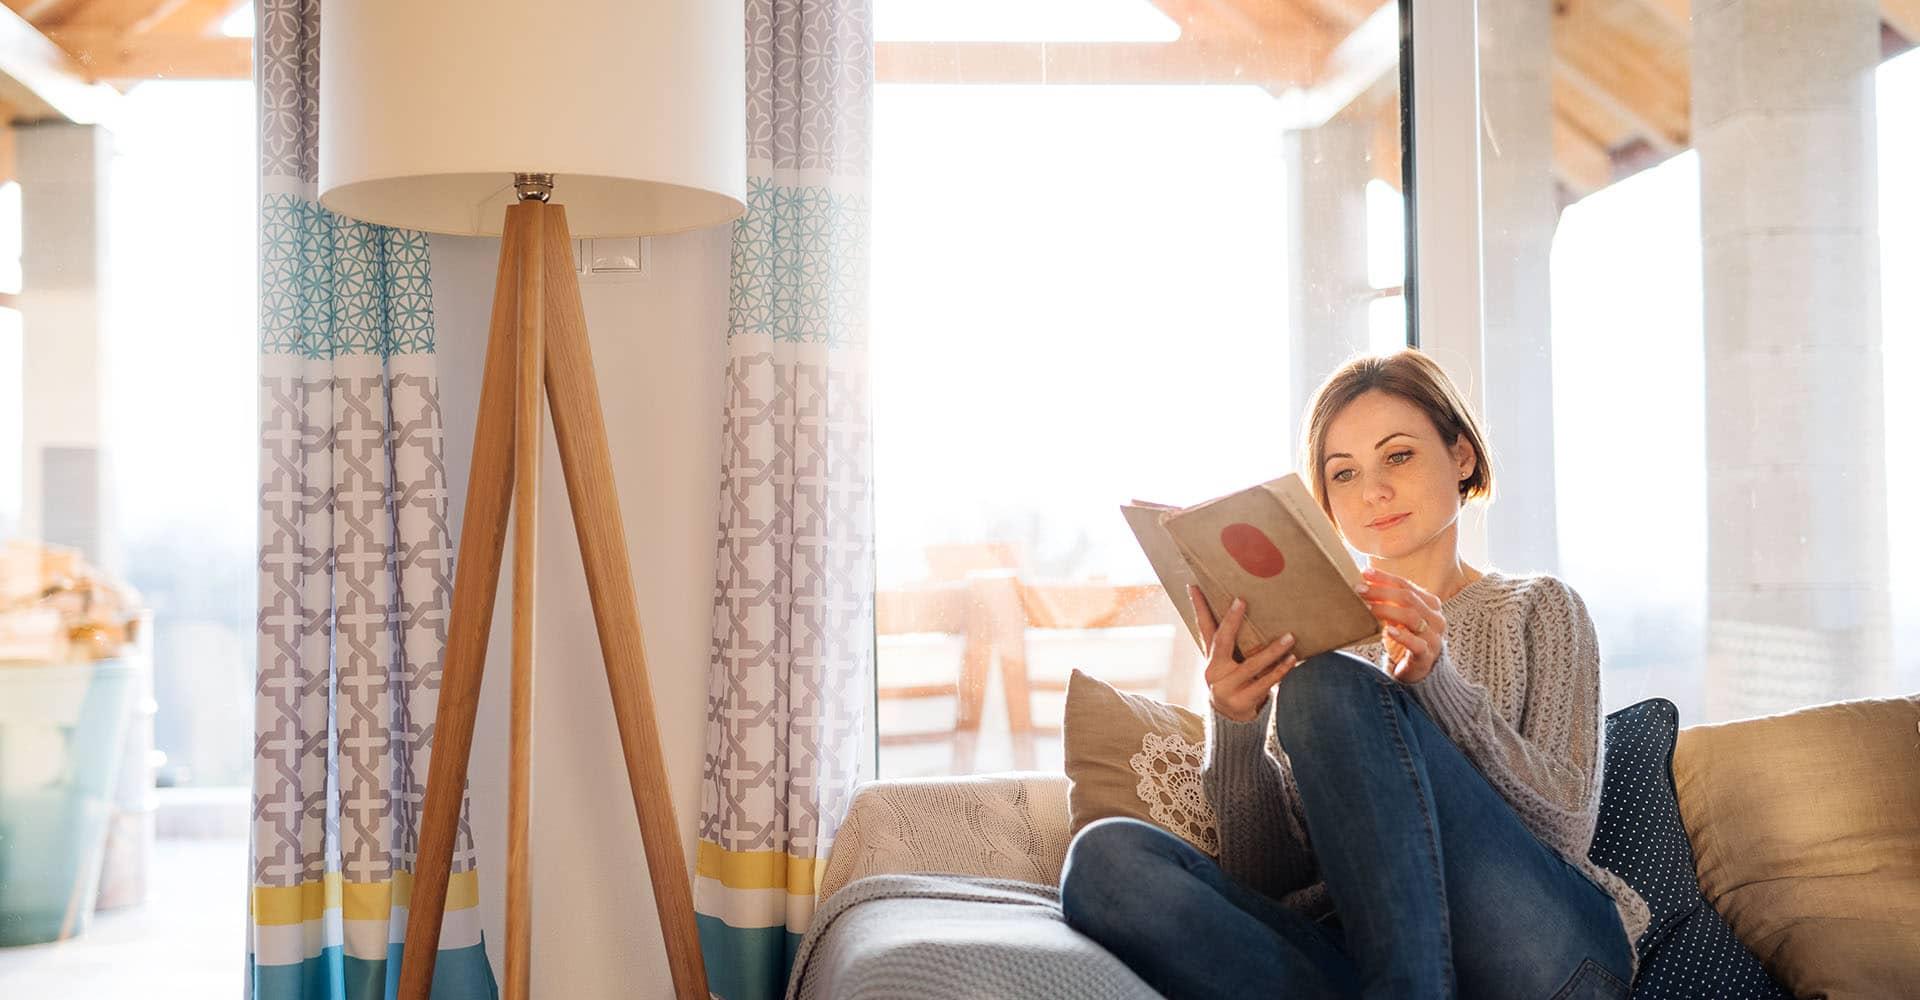 Frau liest mit Leselampe